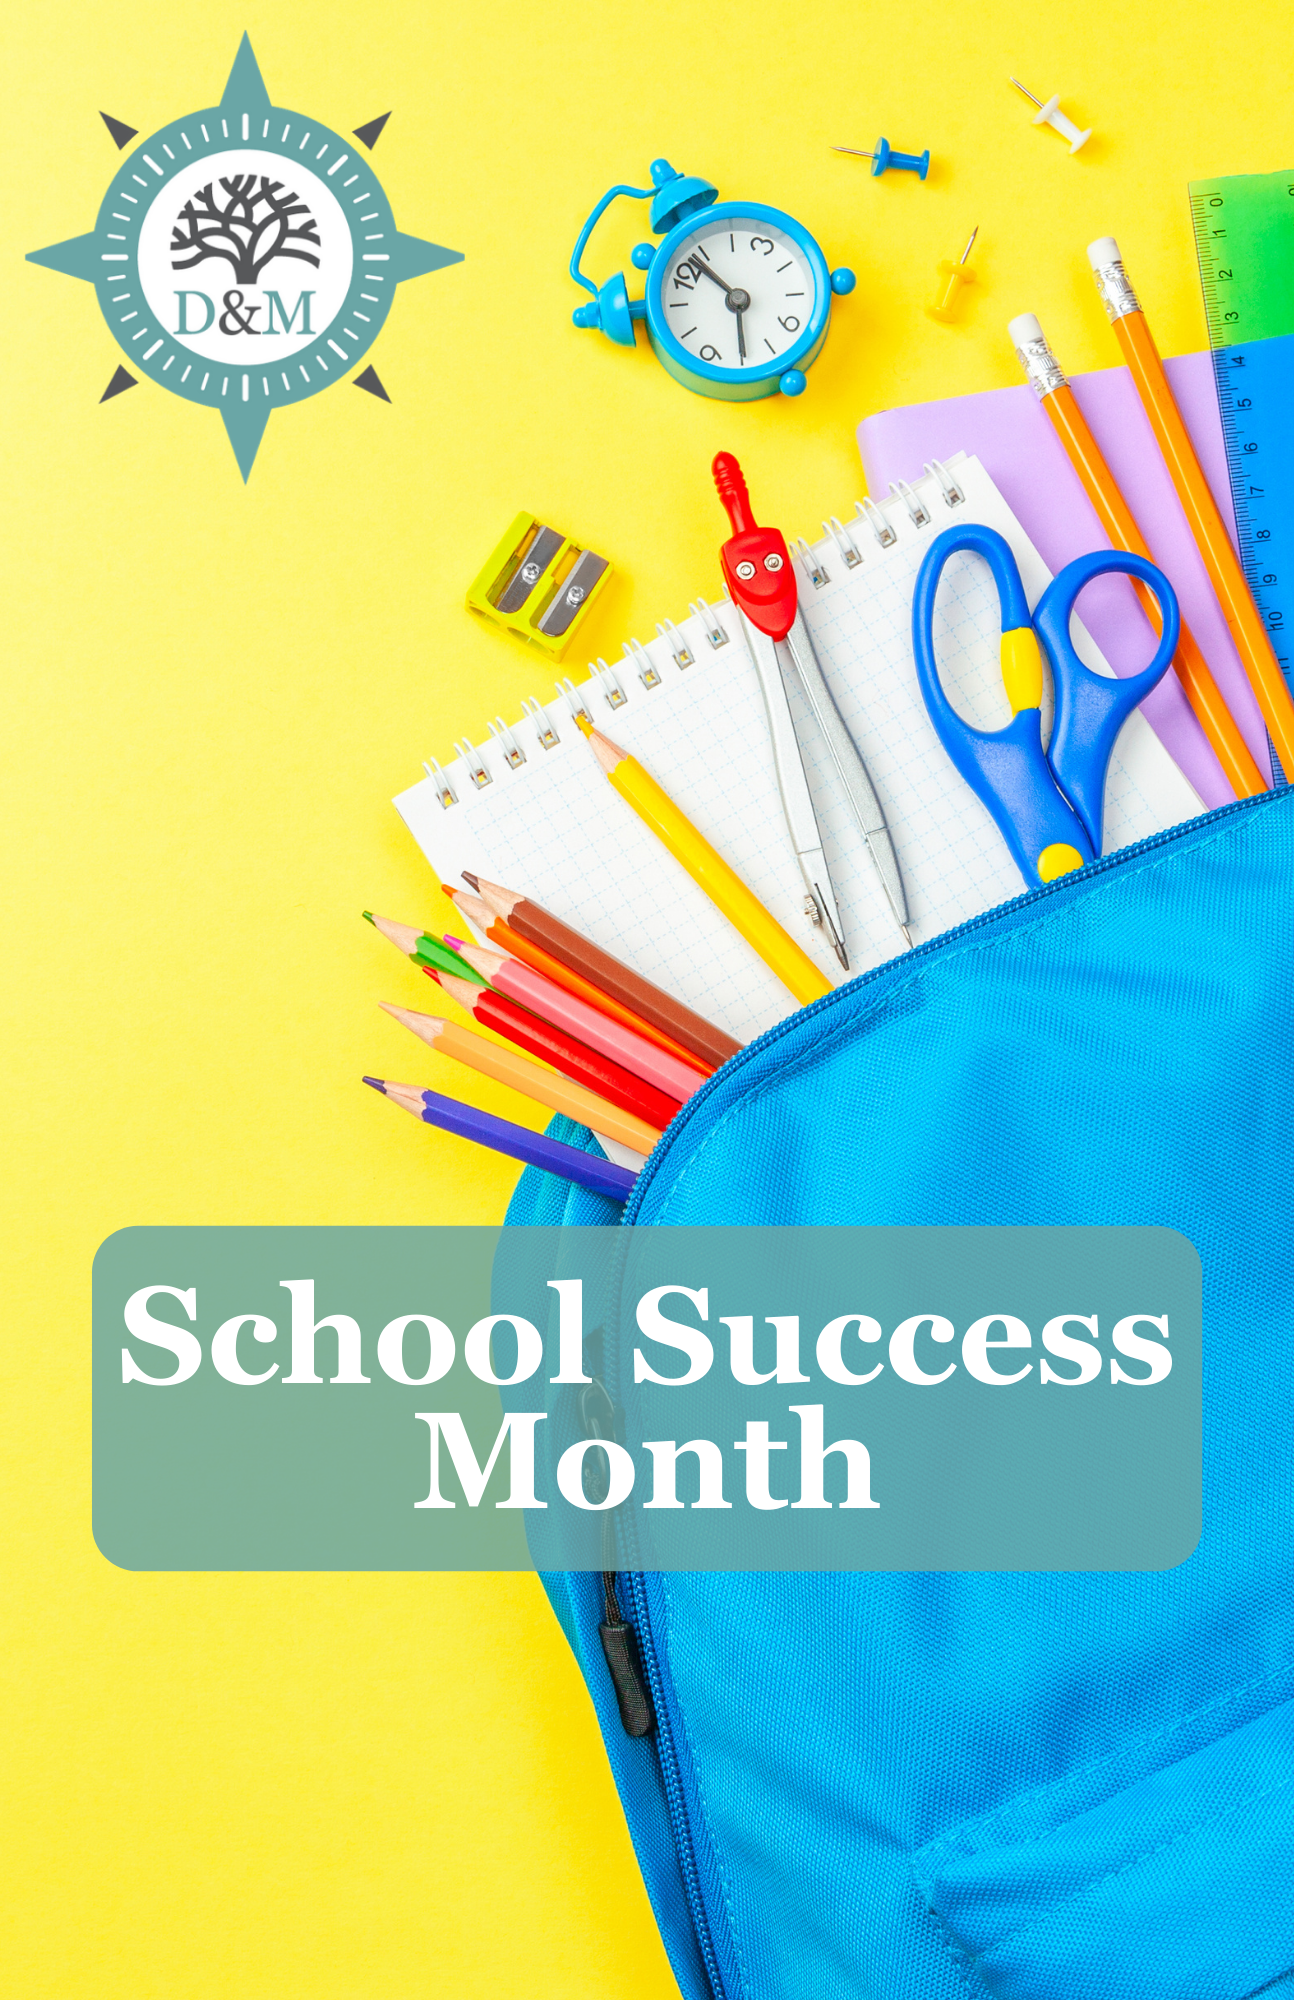 School Success Month